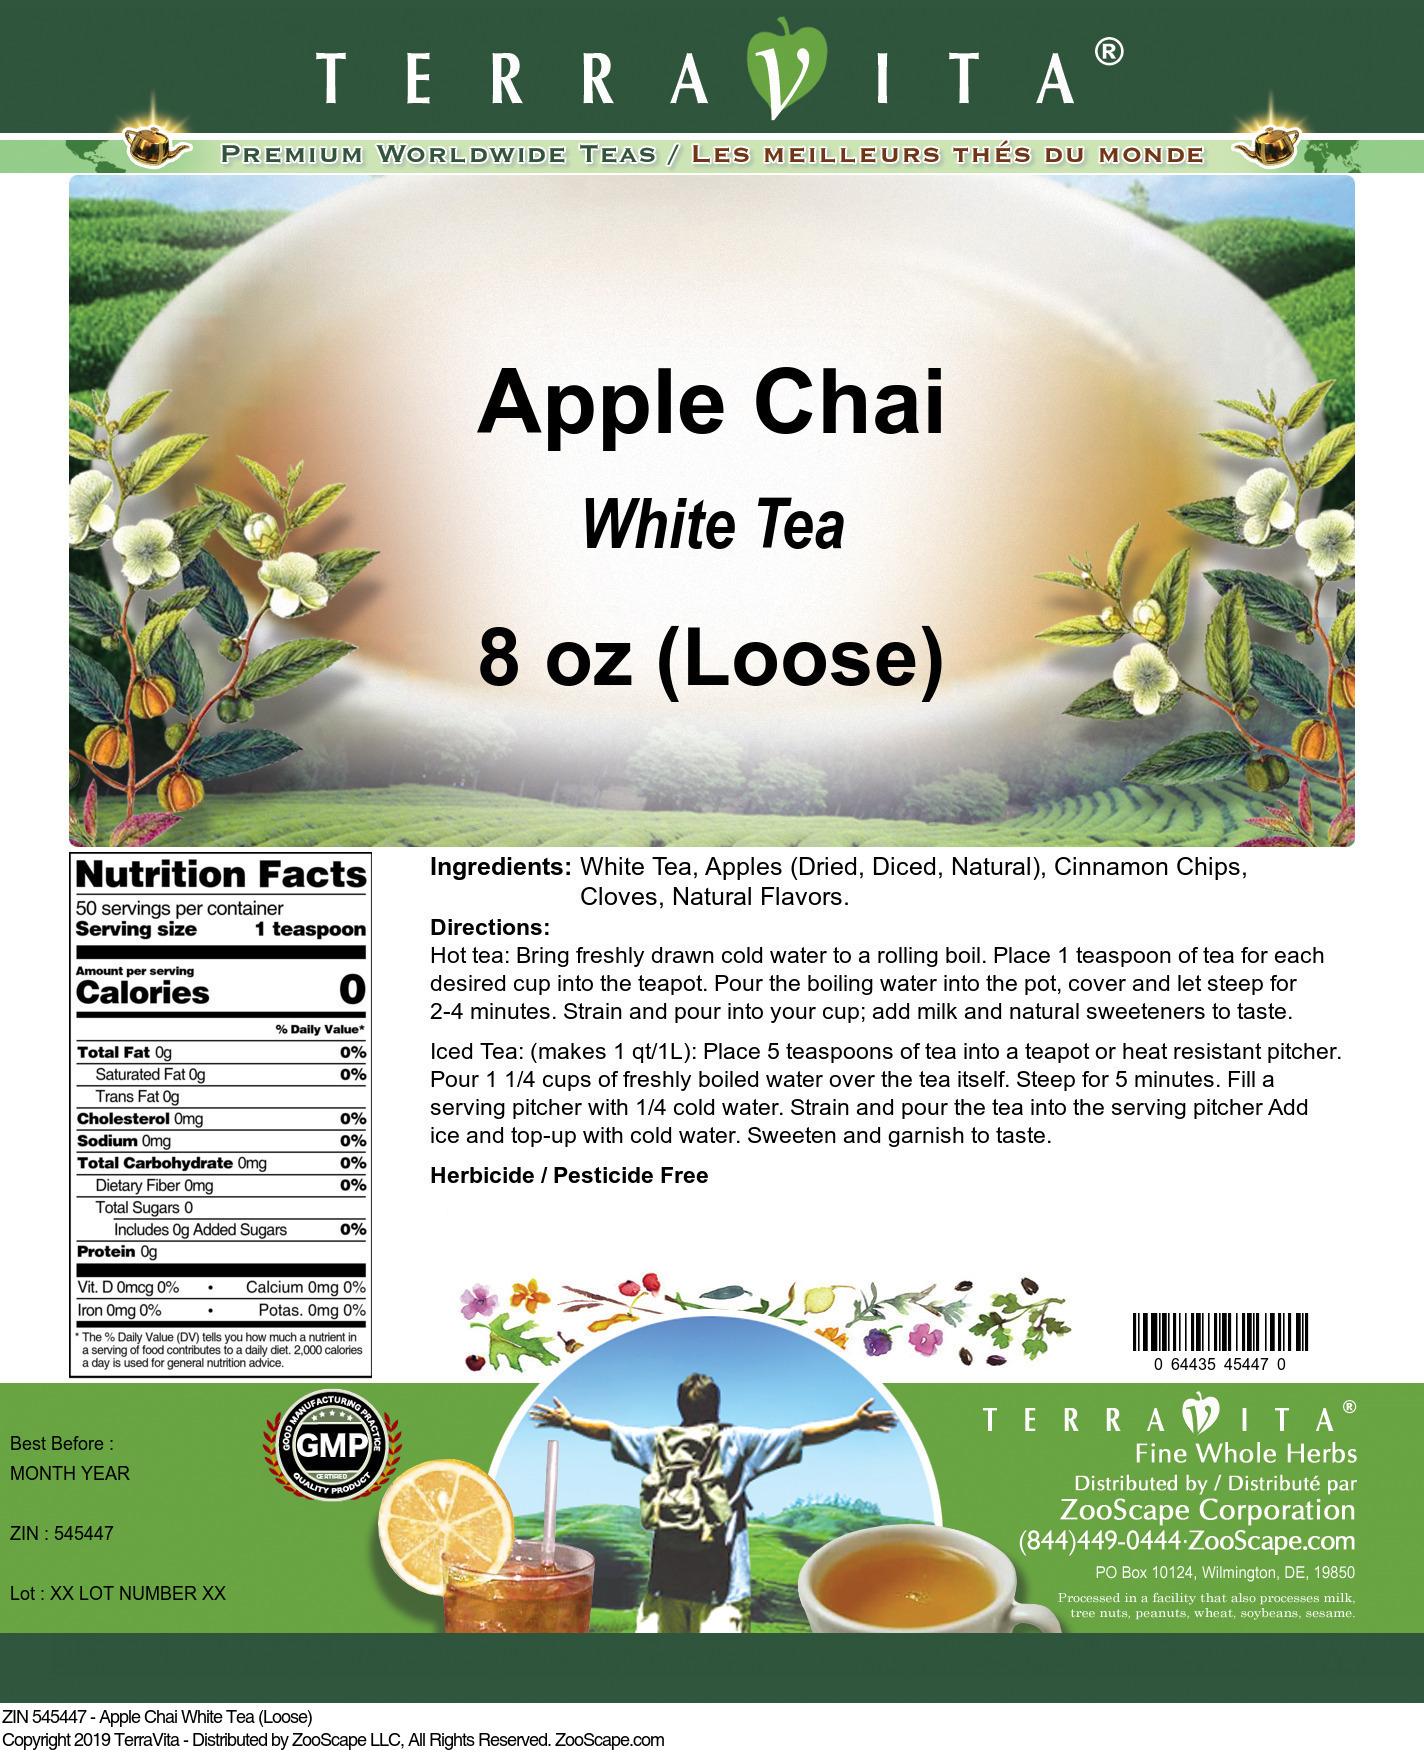 Apple Chai White Tea (Loose)